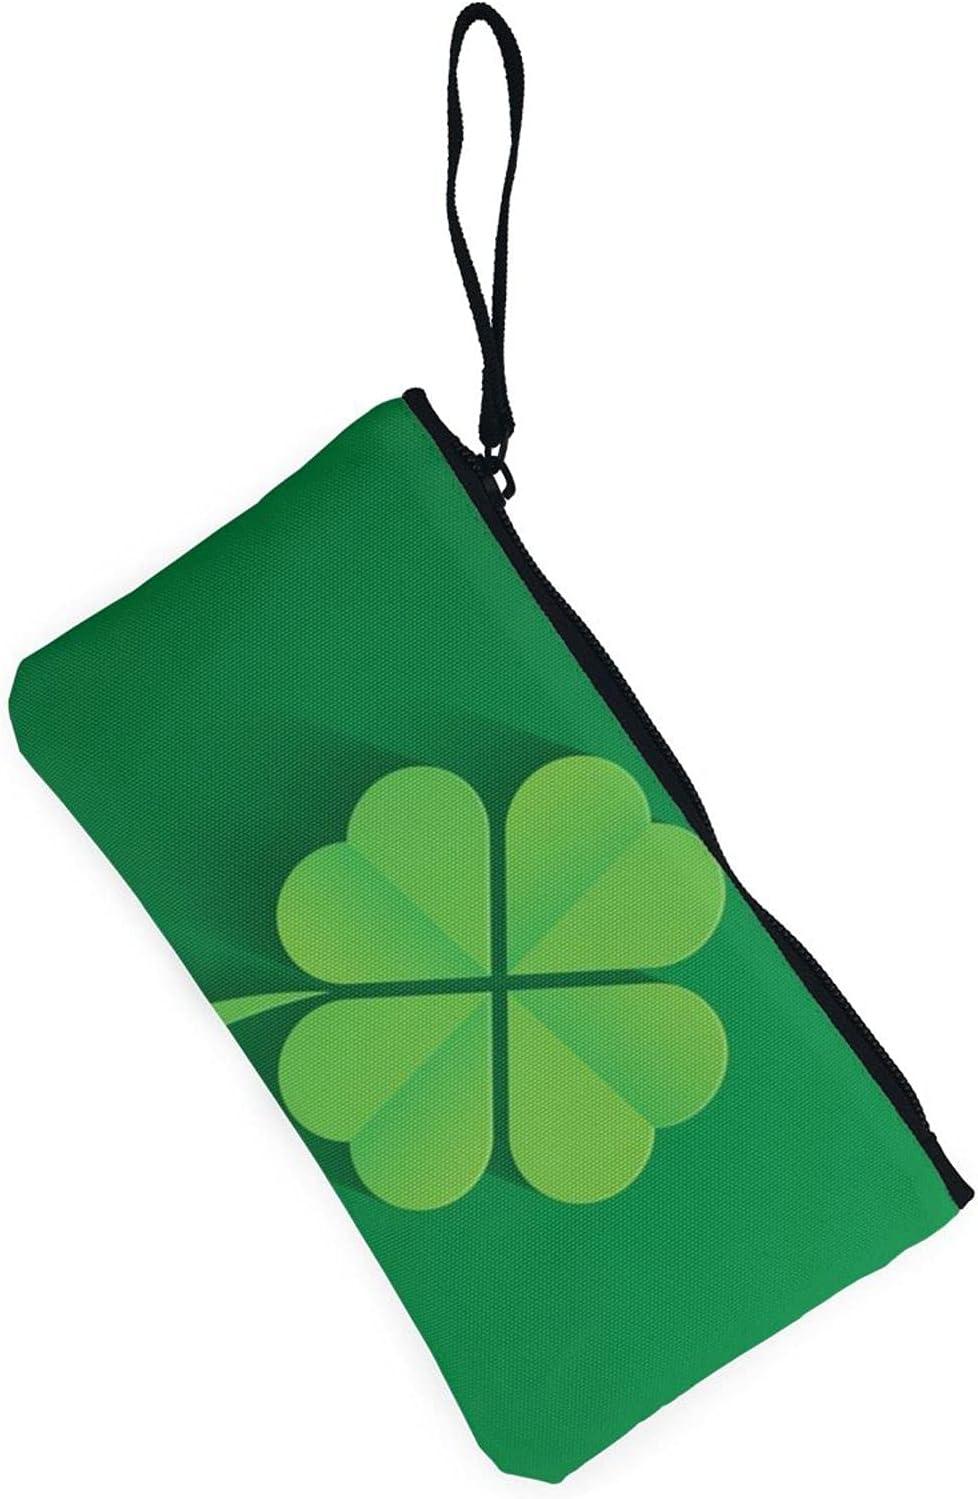 AORRUAM Irish Shamrock Canvas Coin Purse,Canvas Zipper Pencil Cases,Canvas Change Purse Pouch Mini Wallet Coin Bag